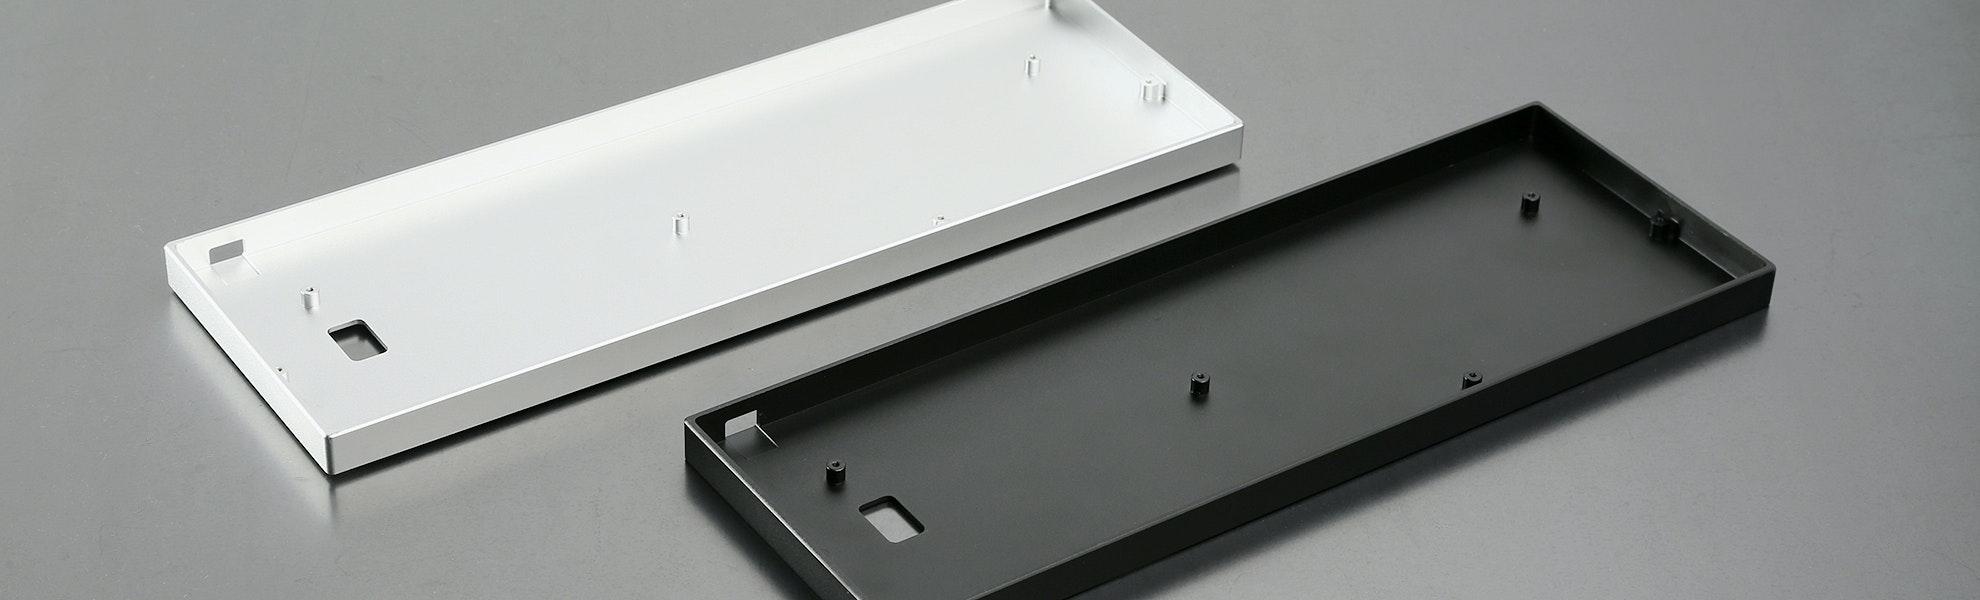 Sentraq Aluminum 60% Keyboard Case